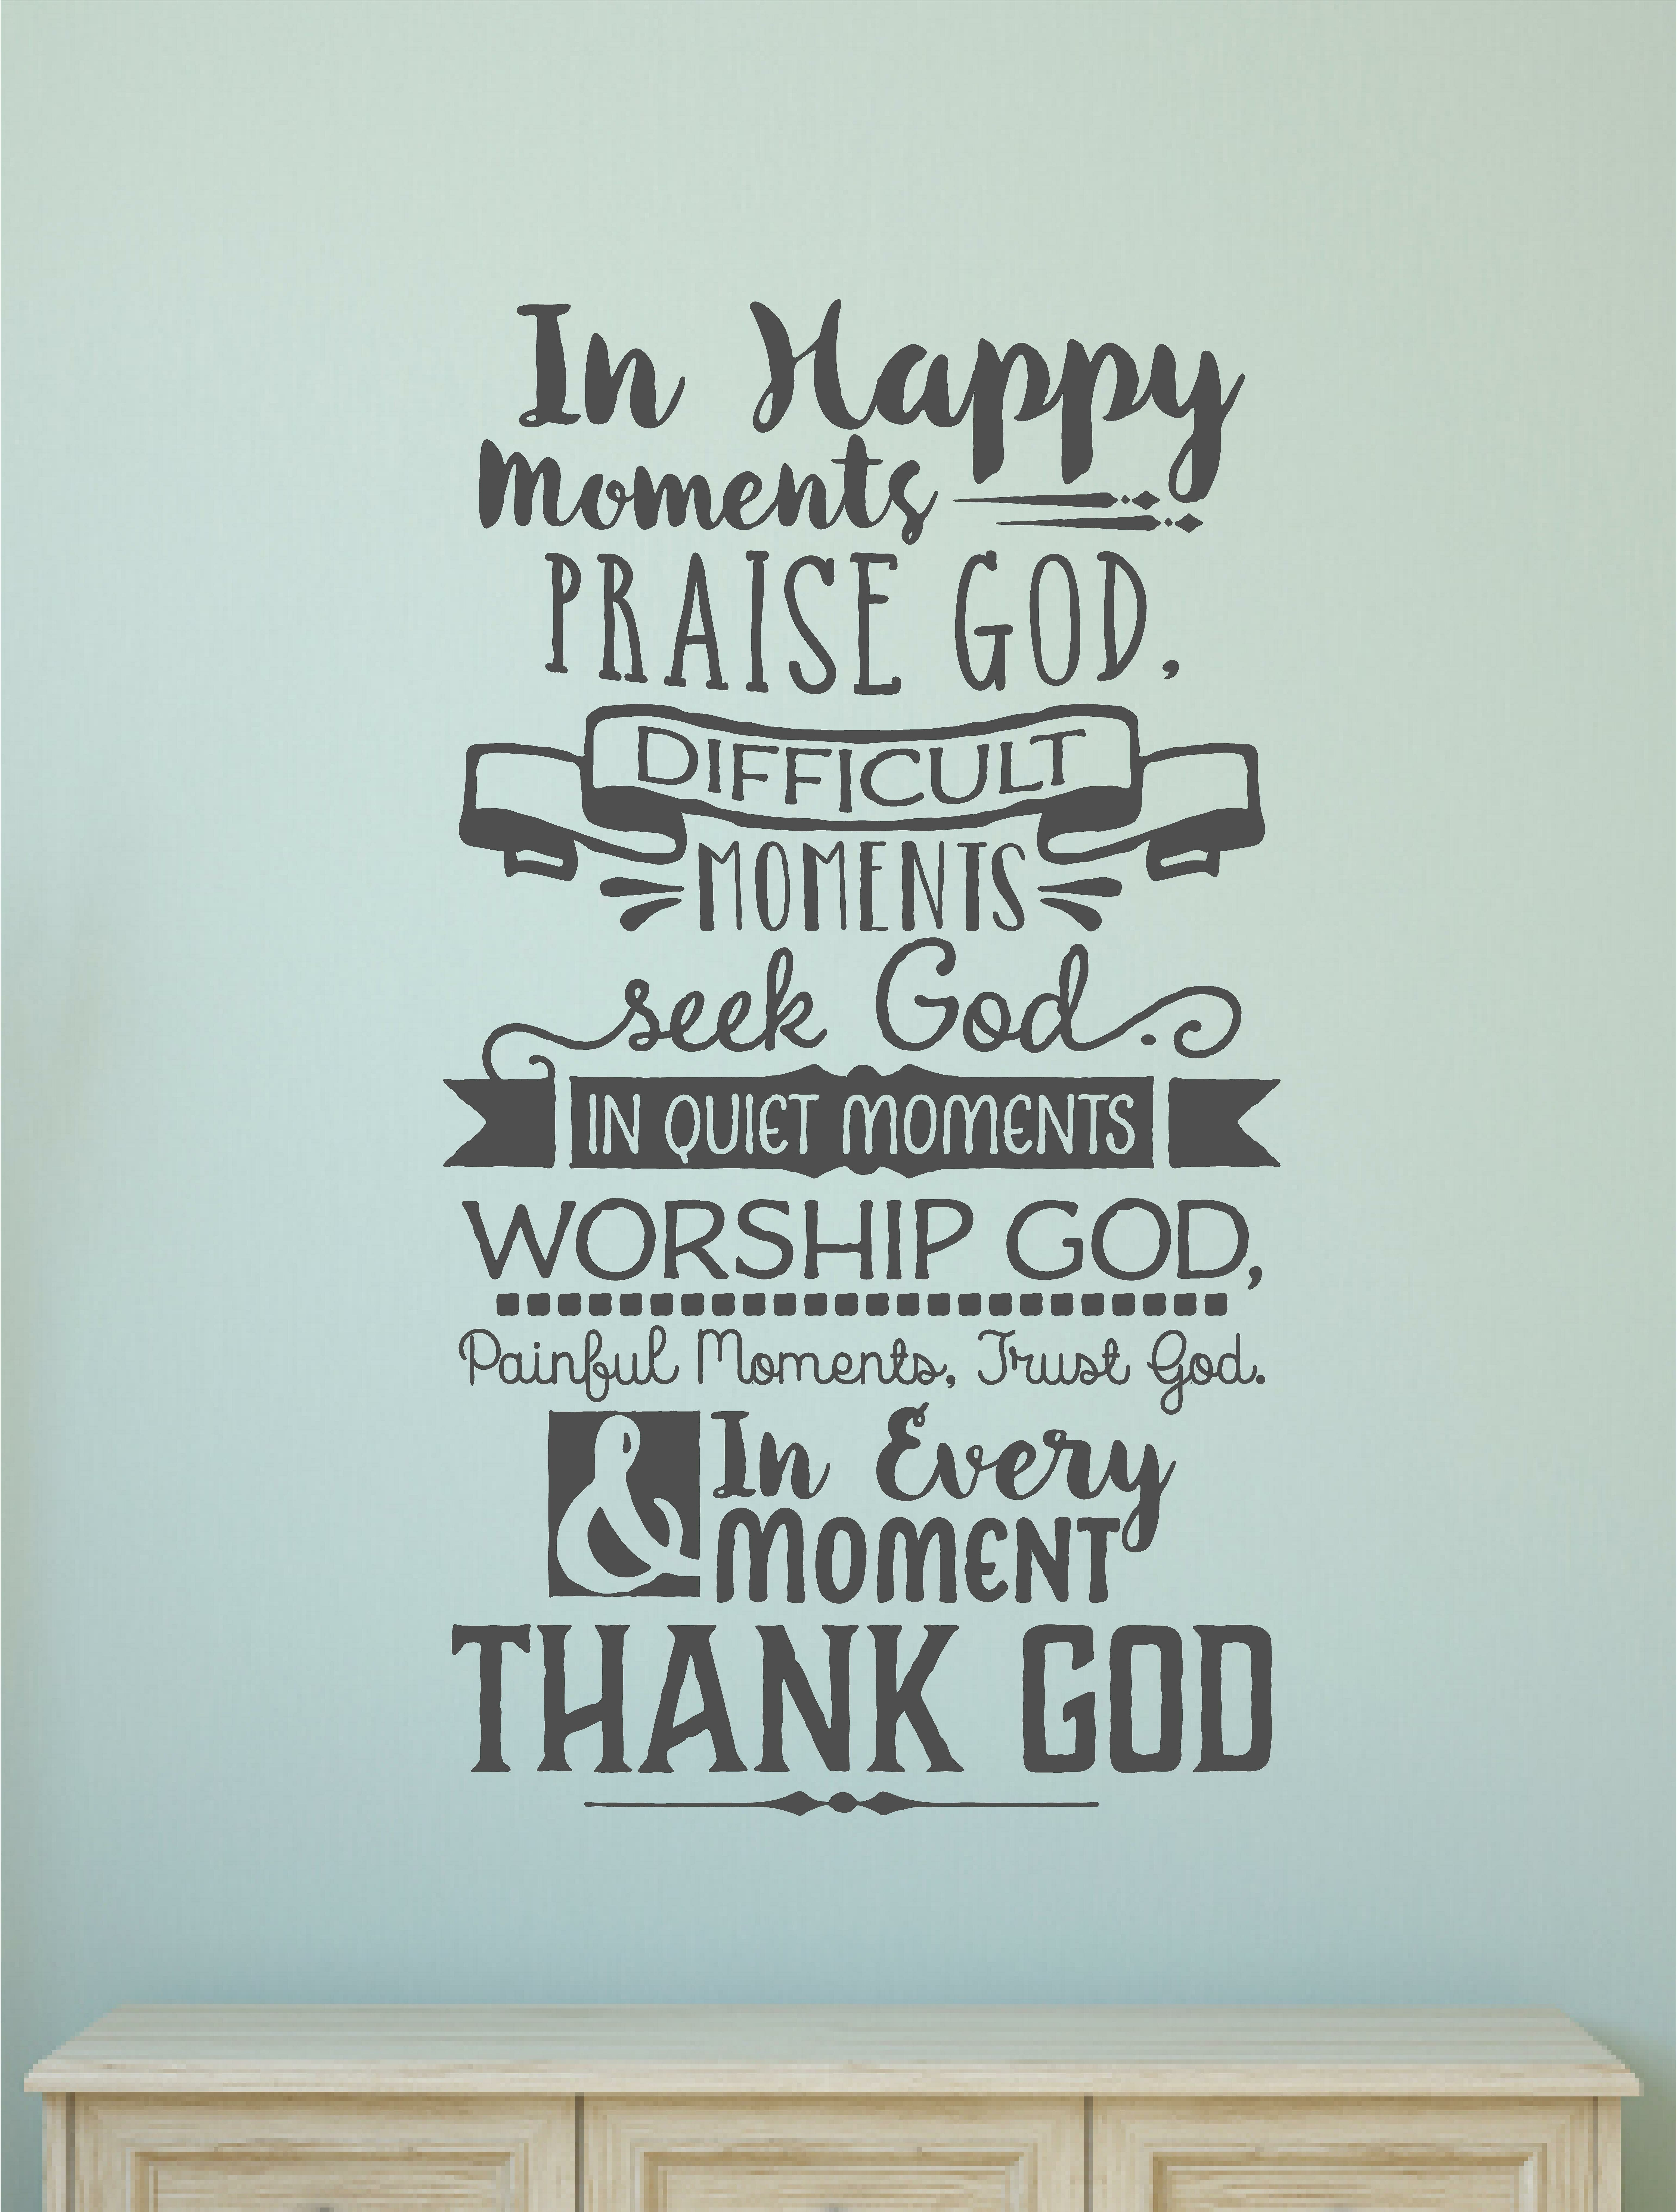 Enchantingly Elegant In Happy Moments Praise God Religious Christian ...